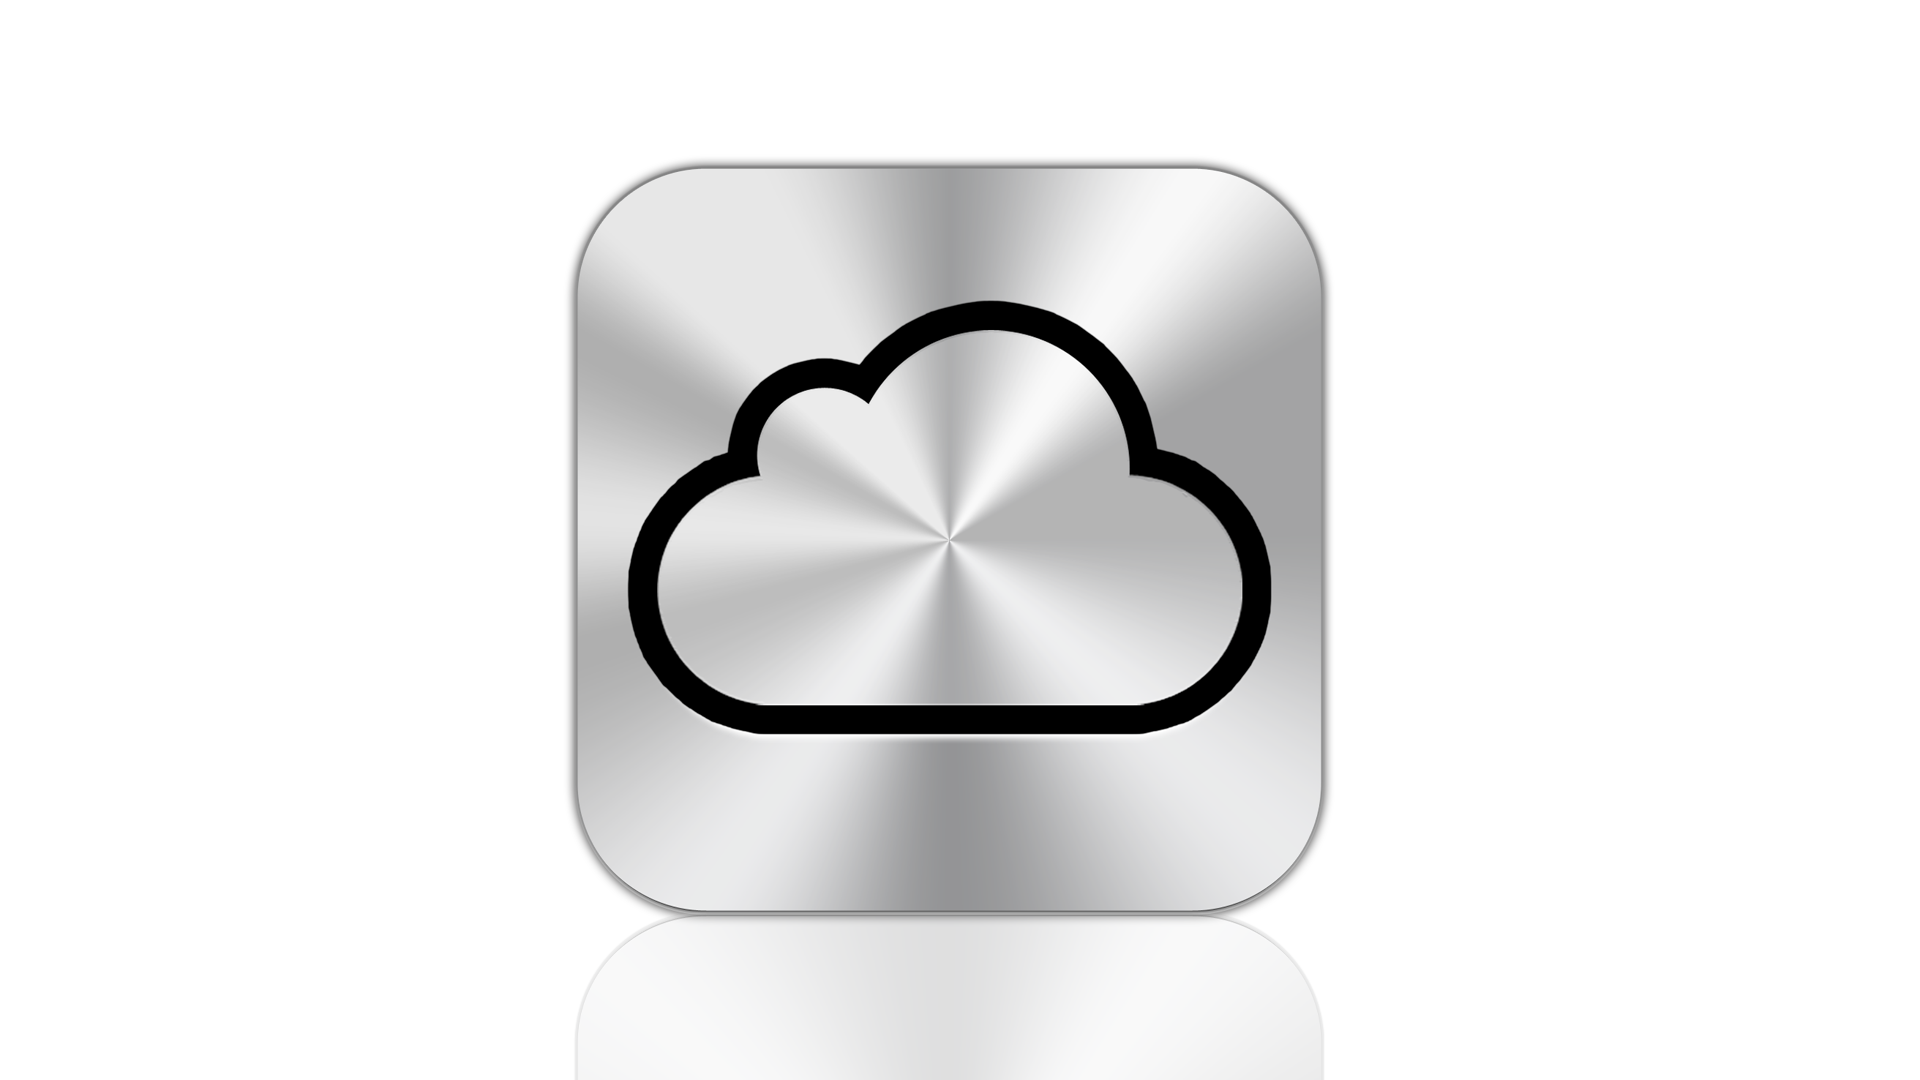 Doodle introduces iCloud integration | Doodle Blog